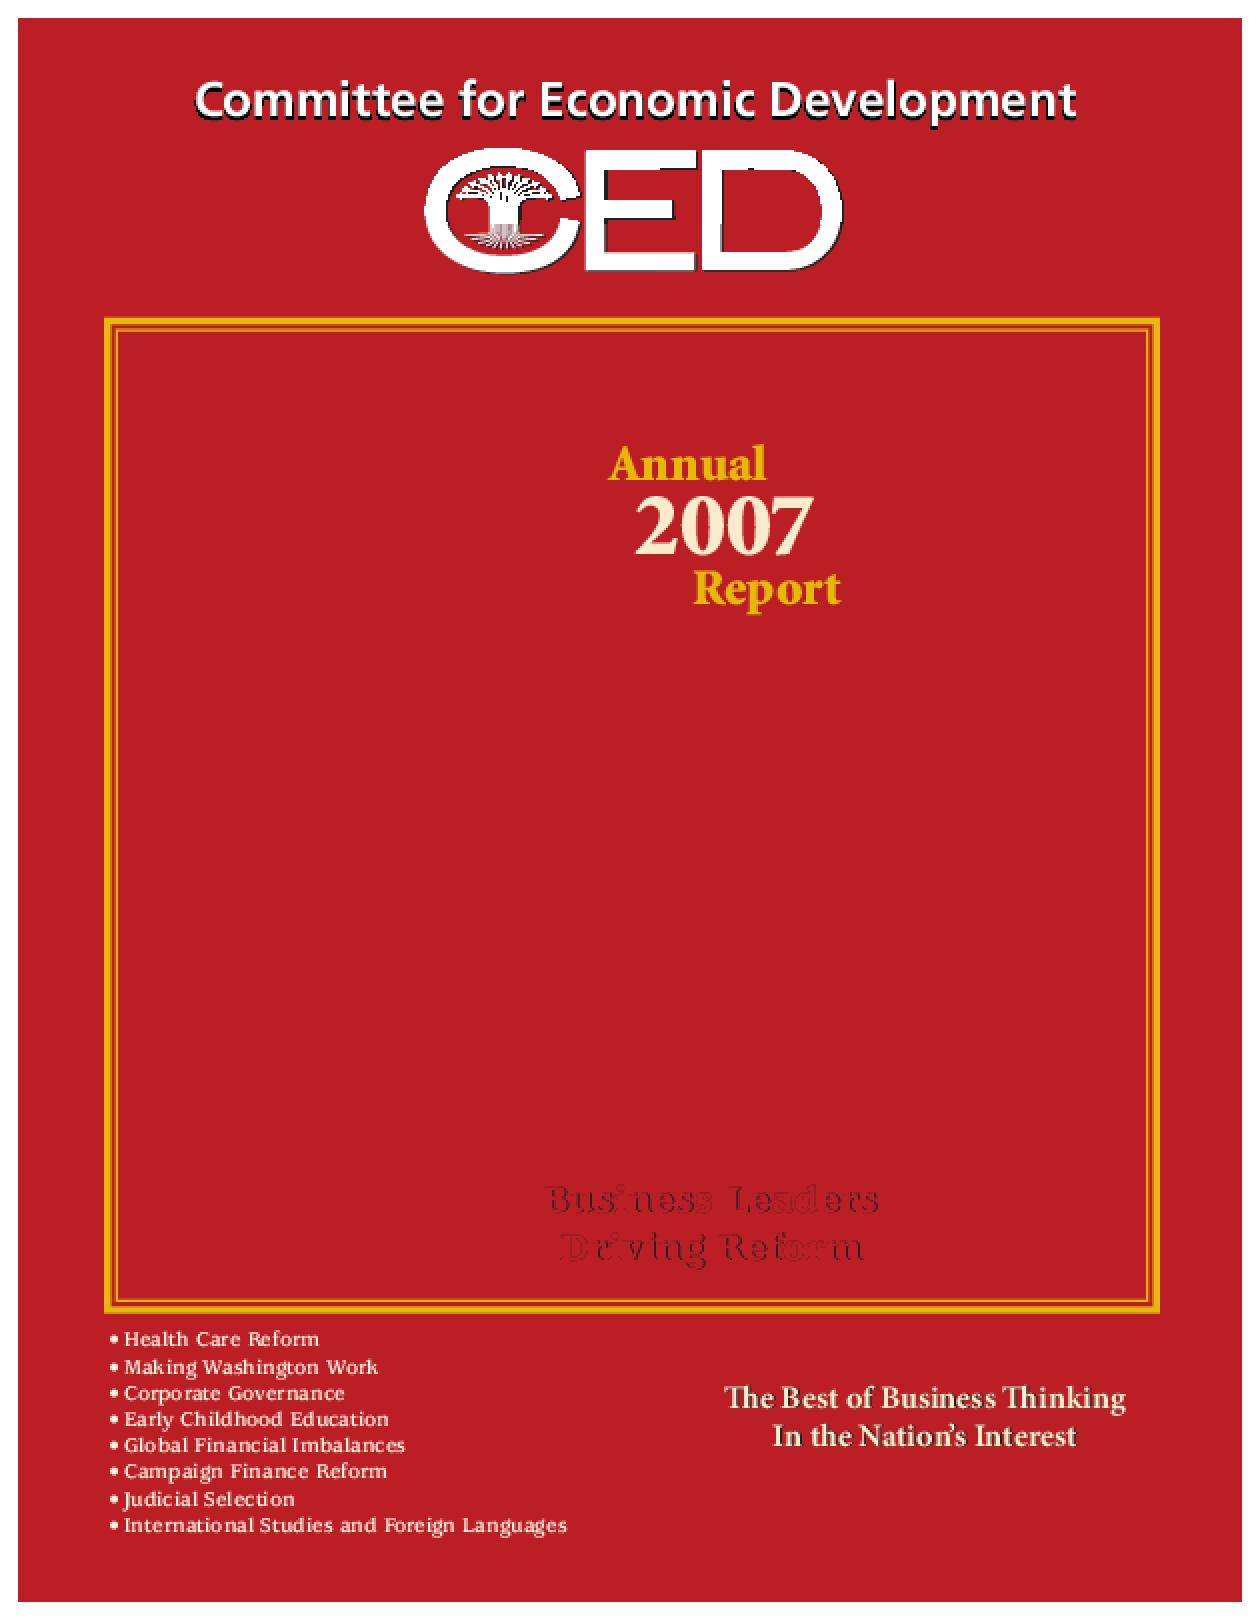 CED's 2007 Annual Report